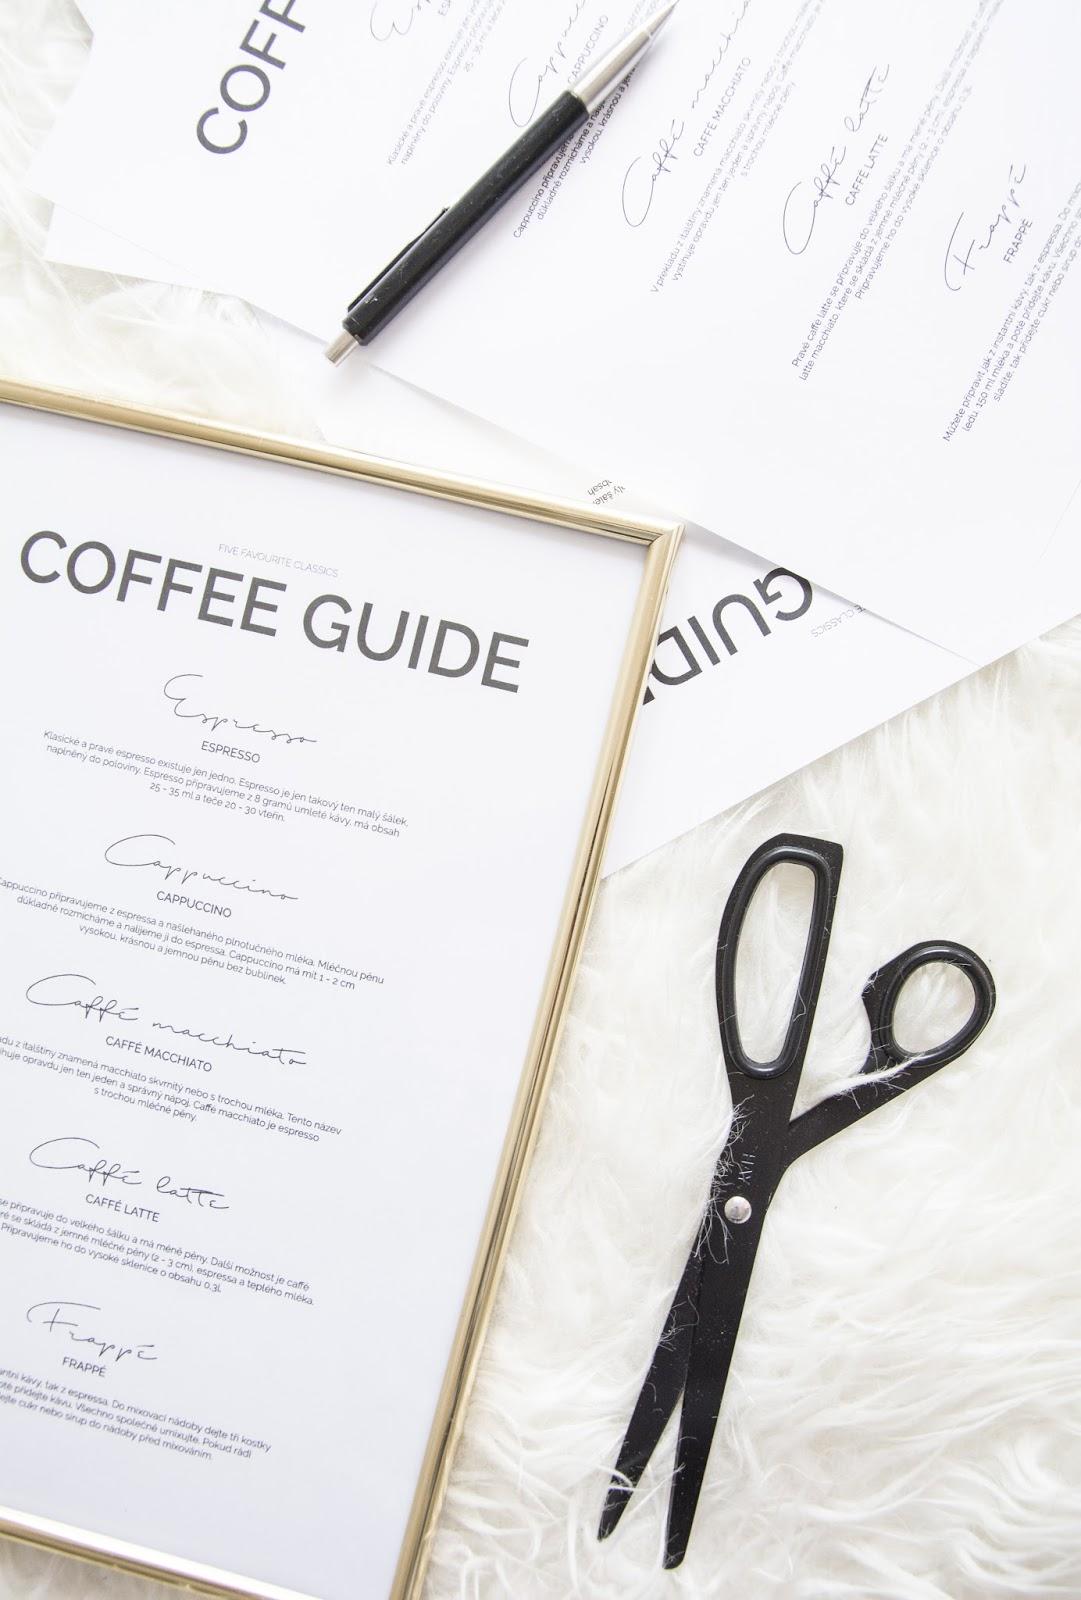 Coffe guide, příprava kávy, skandinávské dekorace, bílý interiér, kajastef